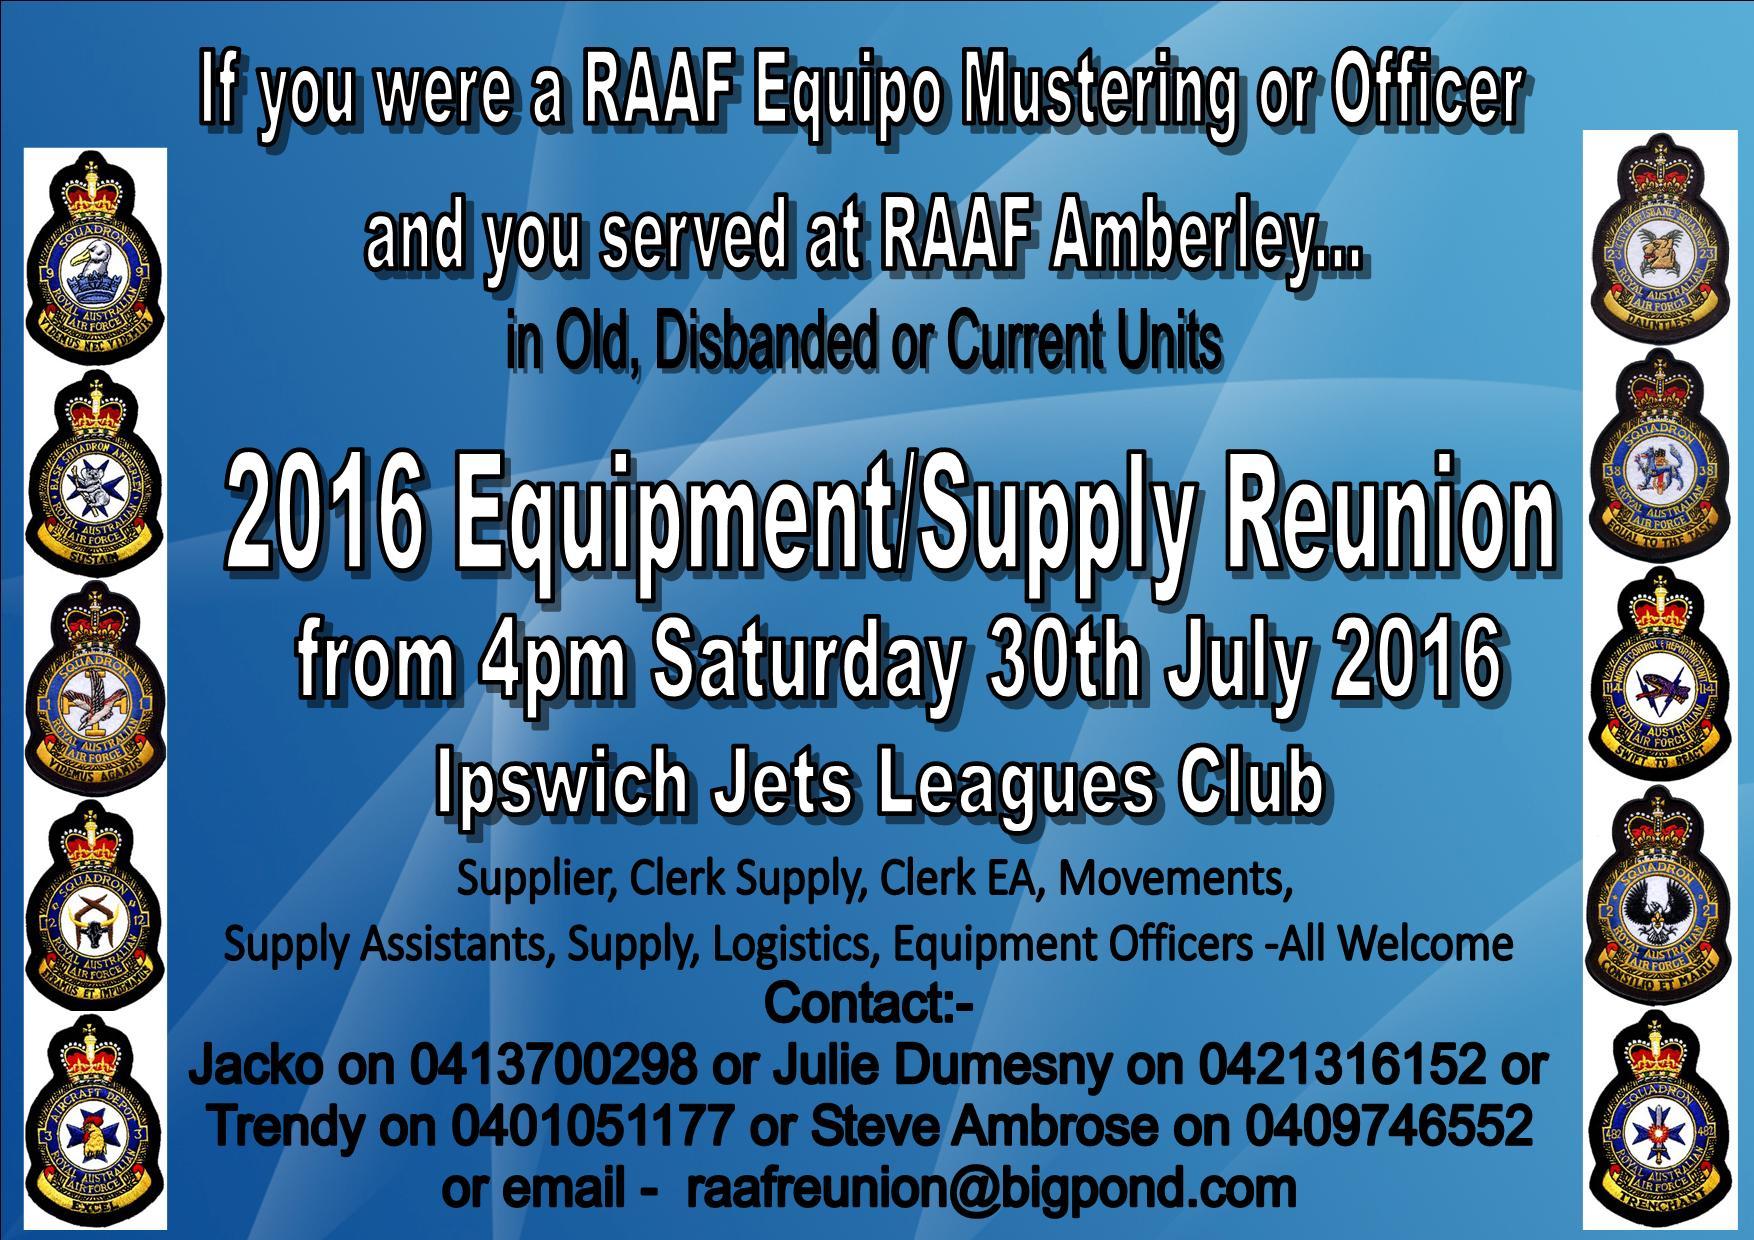 Equipment Supply Reunion 2016